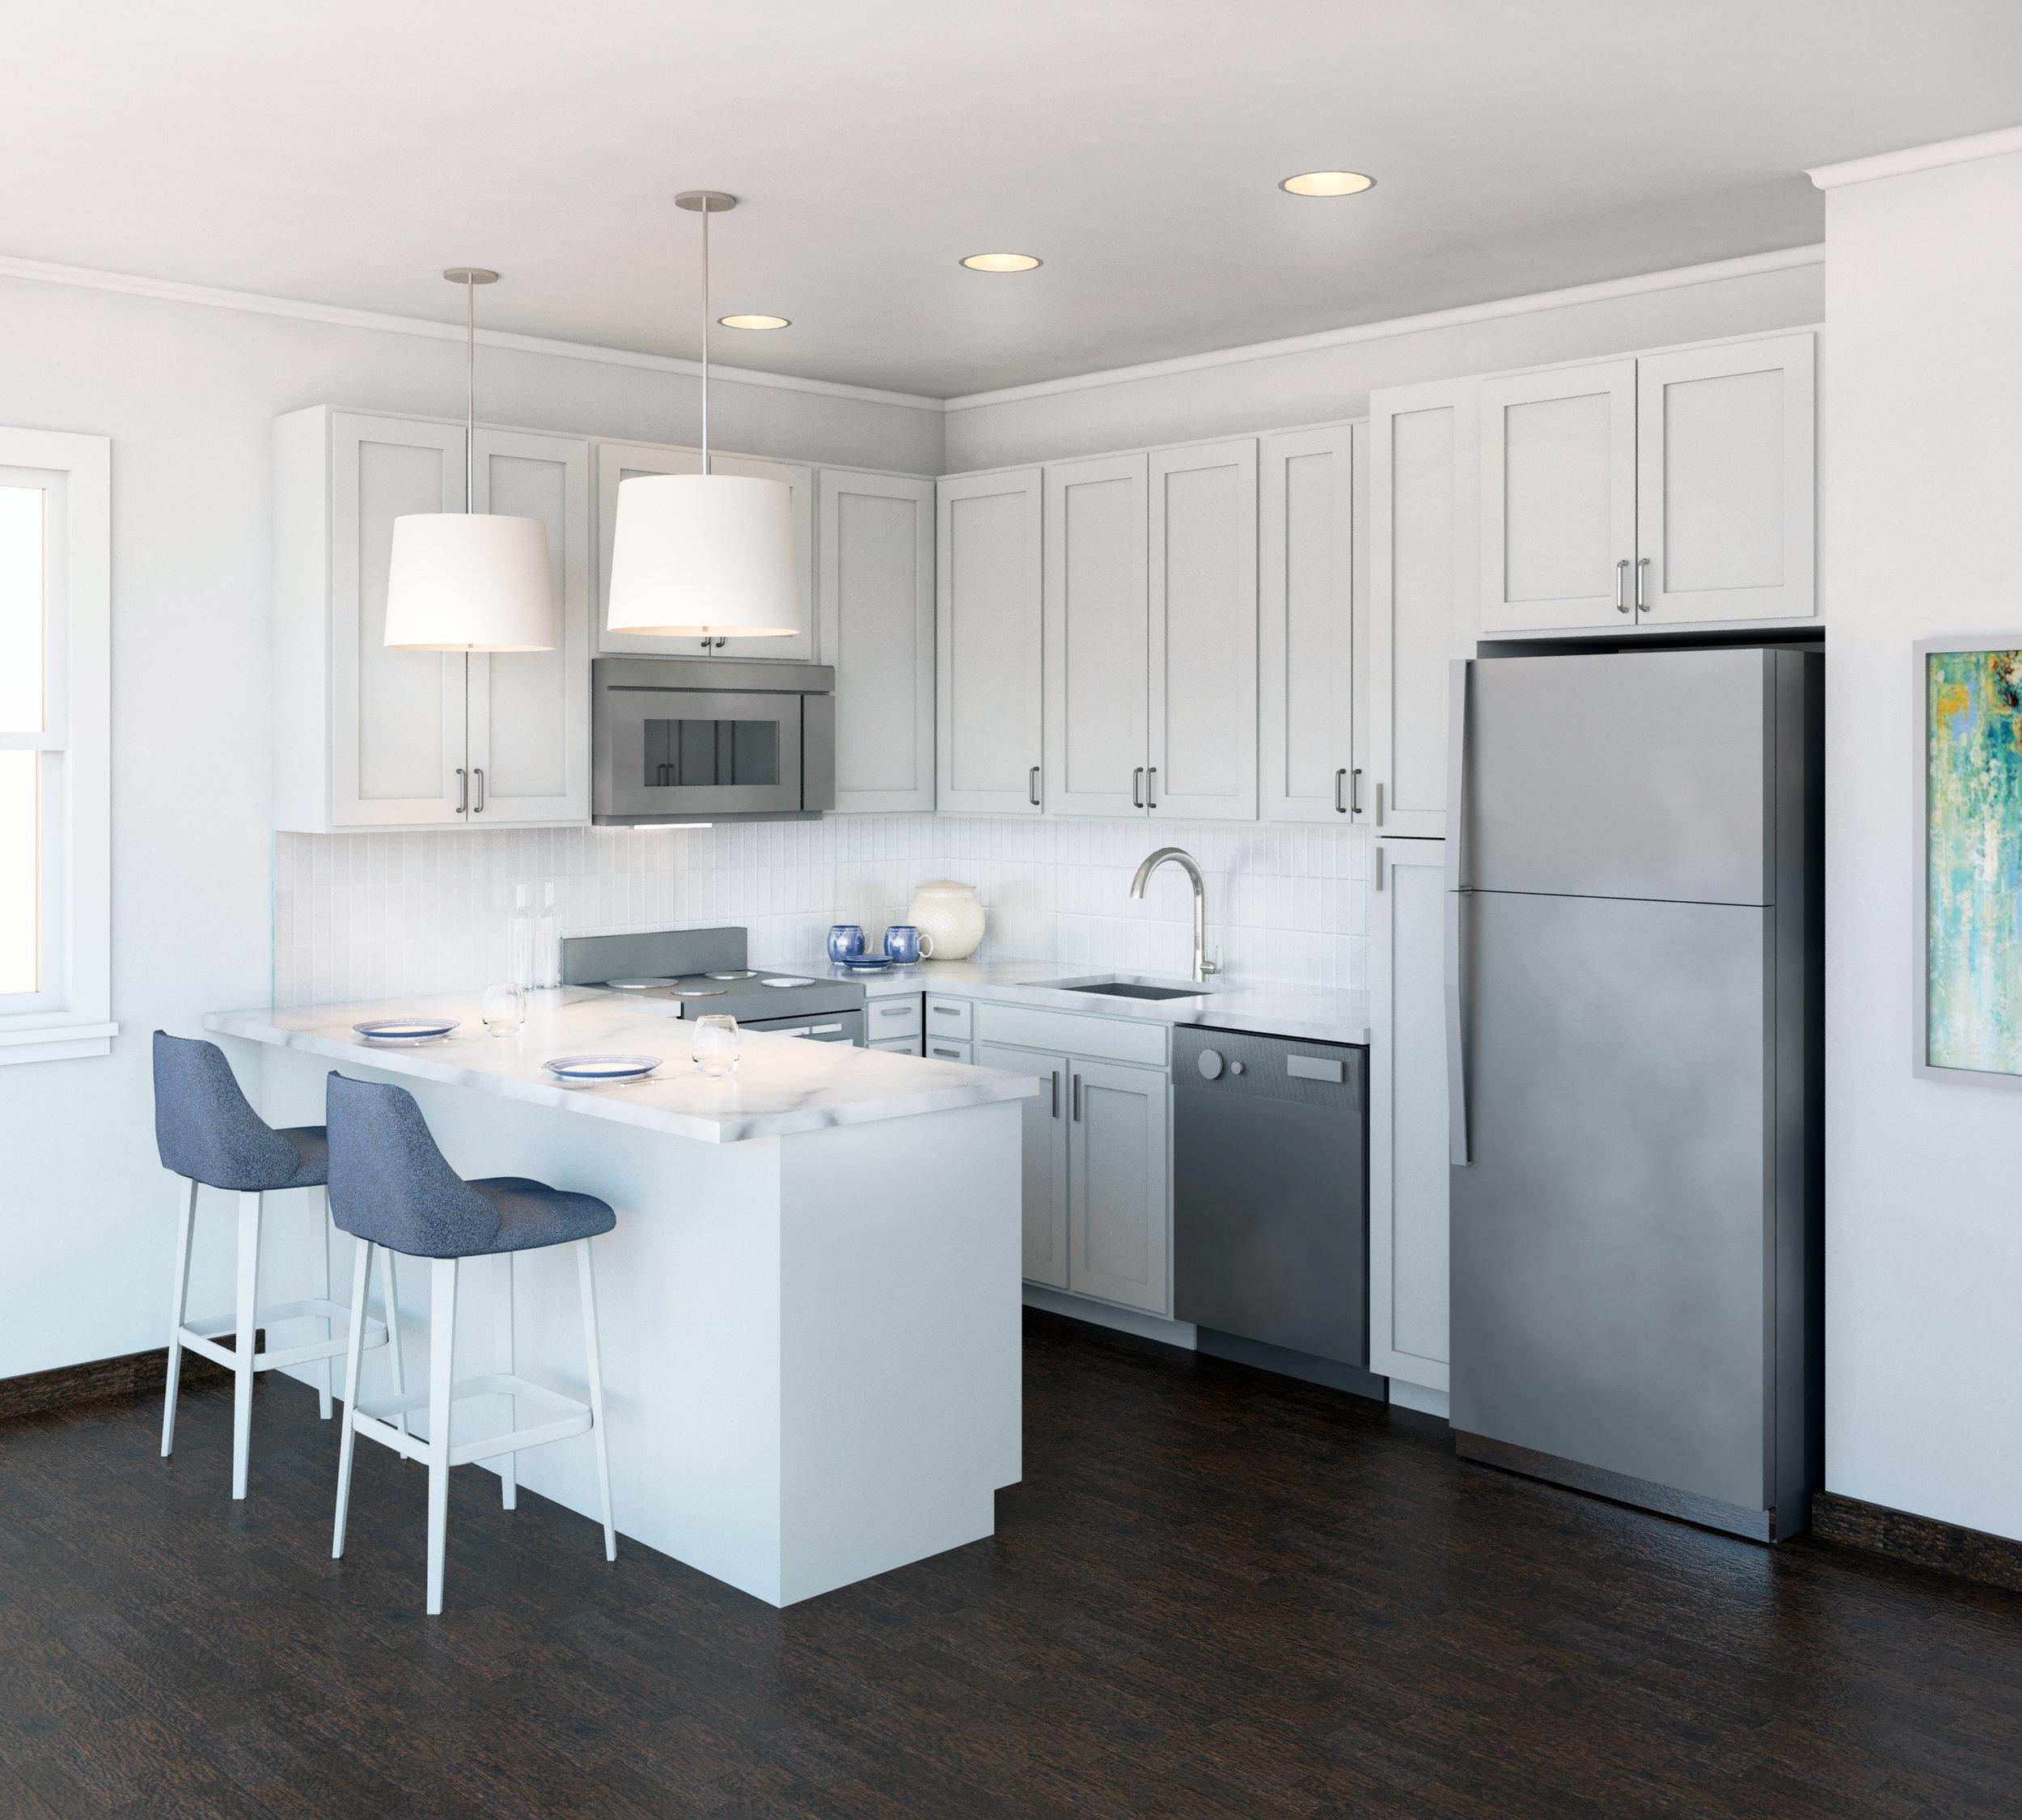 Kitchen_Contemporary_Bright.jpg